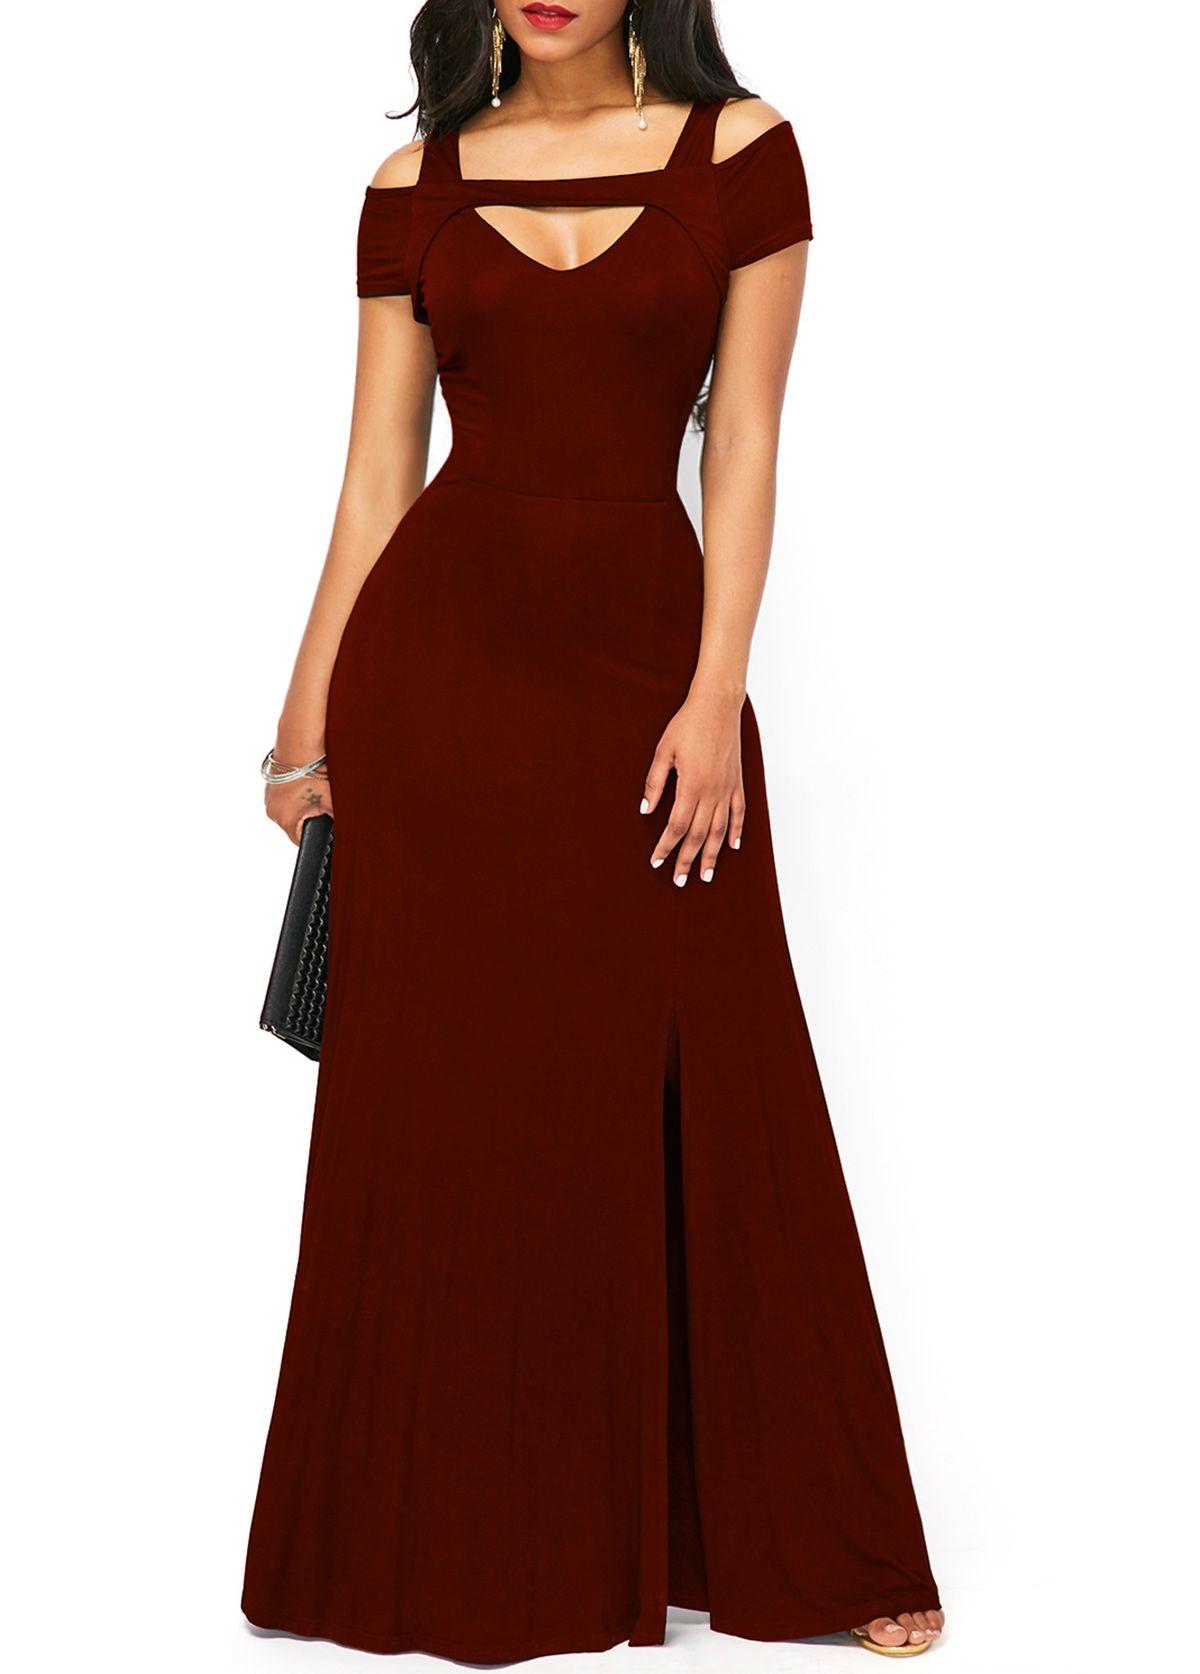 Zipper back cold shoulder front slit maxi dress wedding hostess